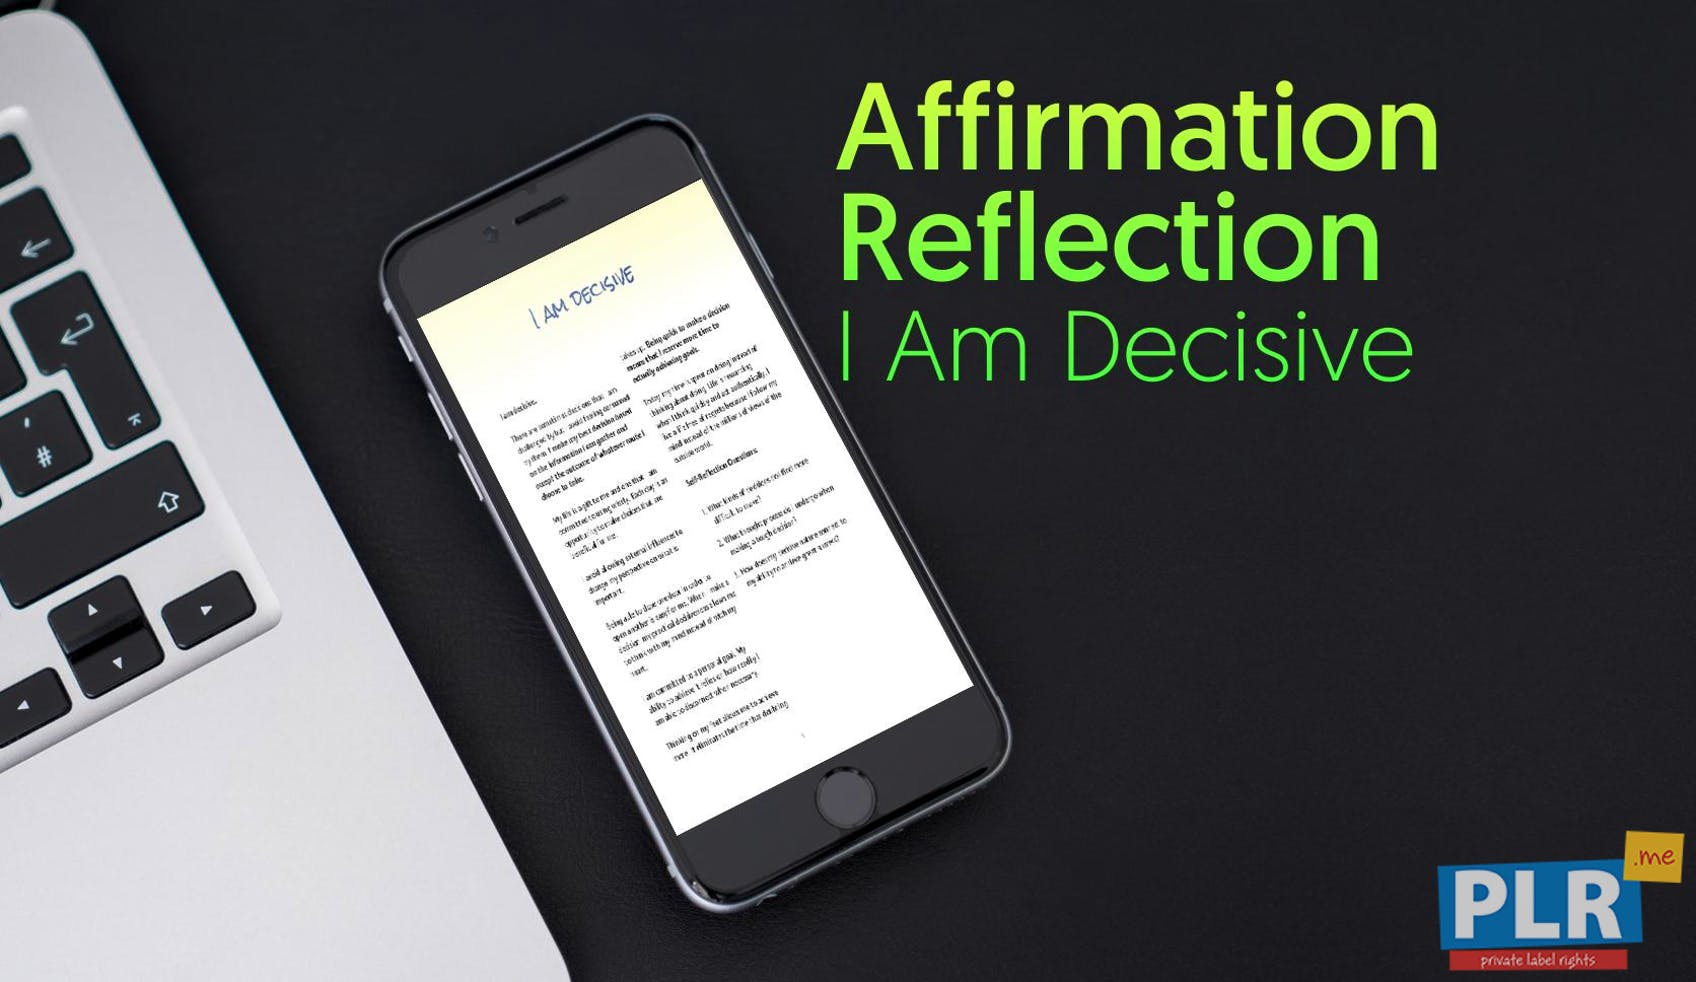 I Am Decisive